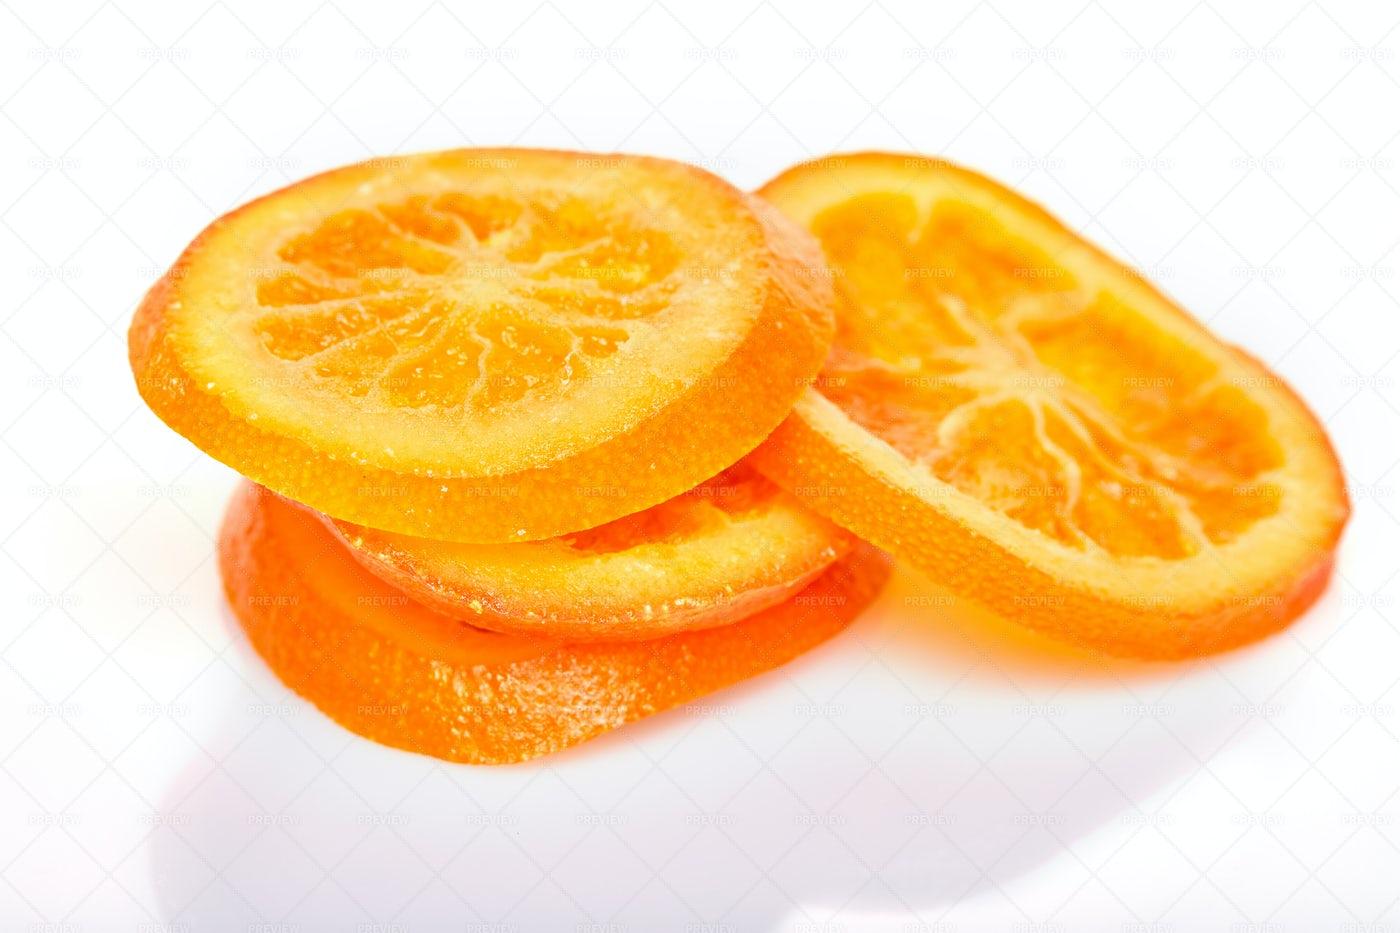 Slices Dried Oranges Or Tangerines: Stock Photos